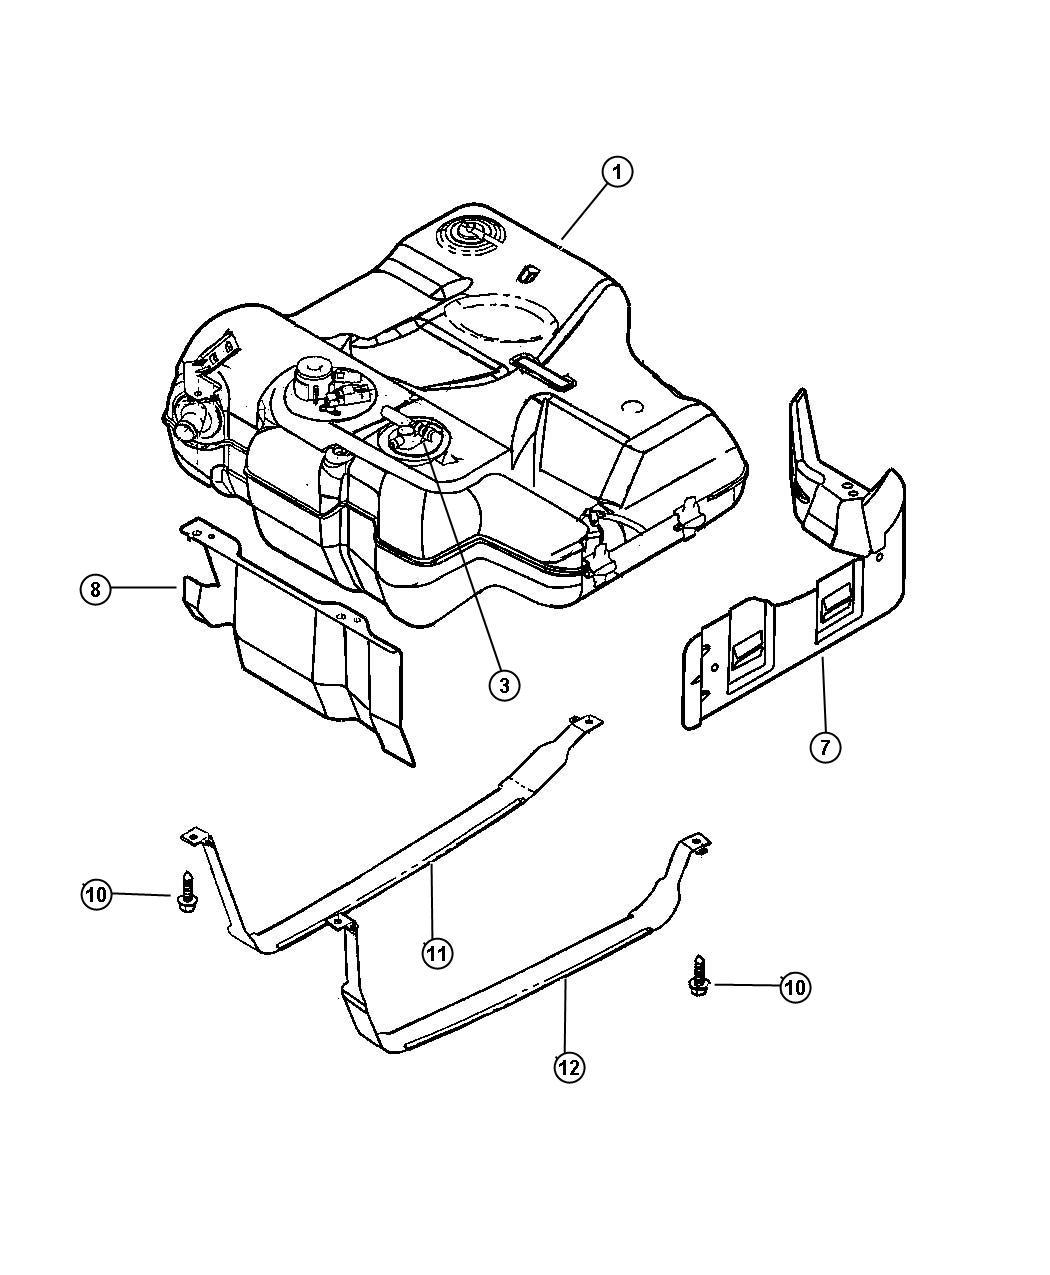 Dodge Intrepid Wiring. Fuel tank jumper. Unleaded fuel